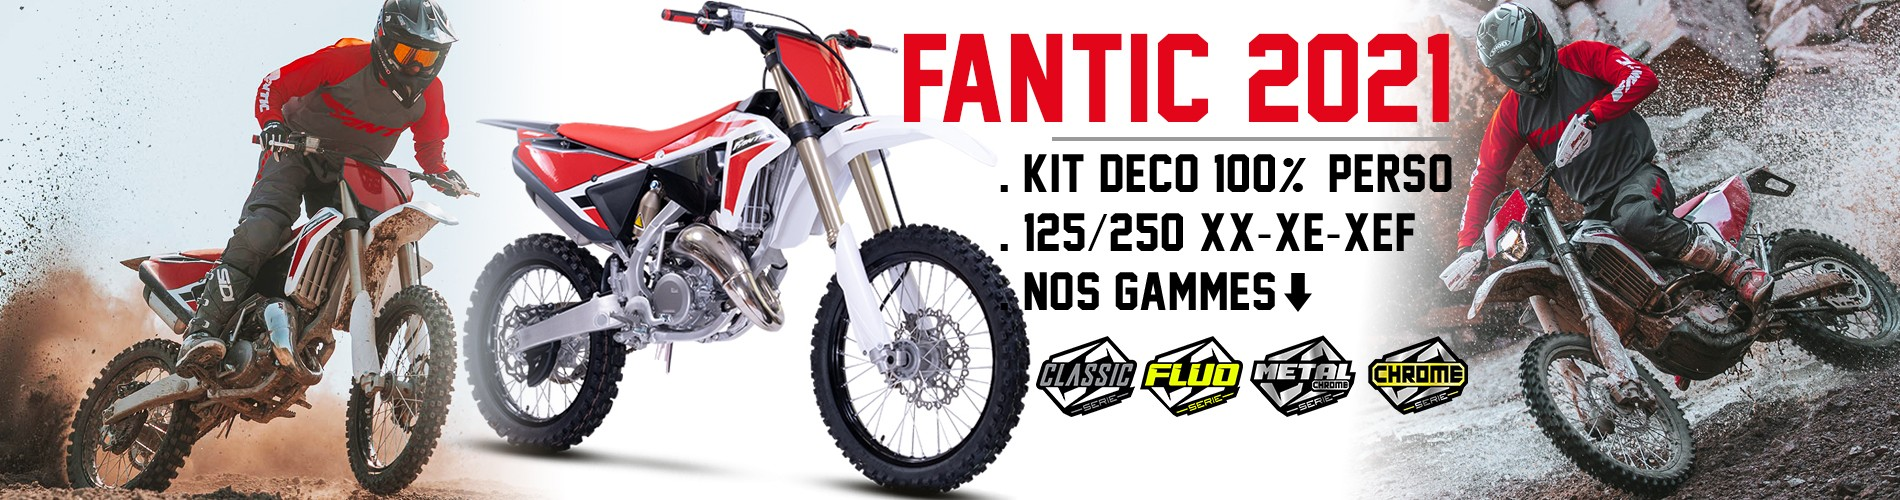 fantic XX, XE, XEF